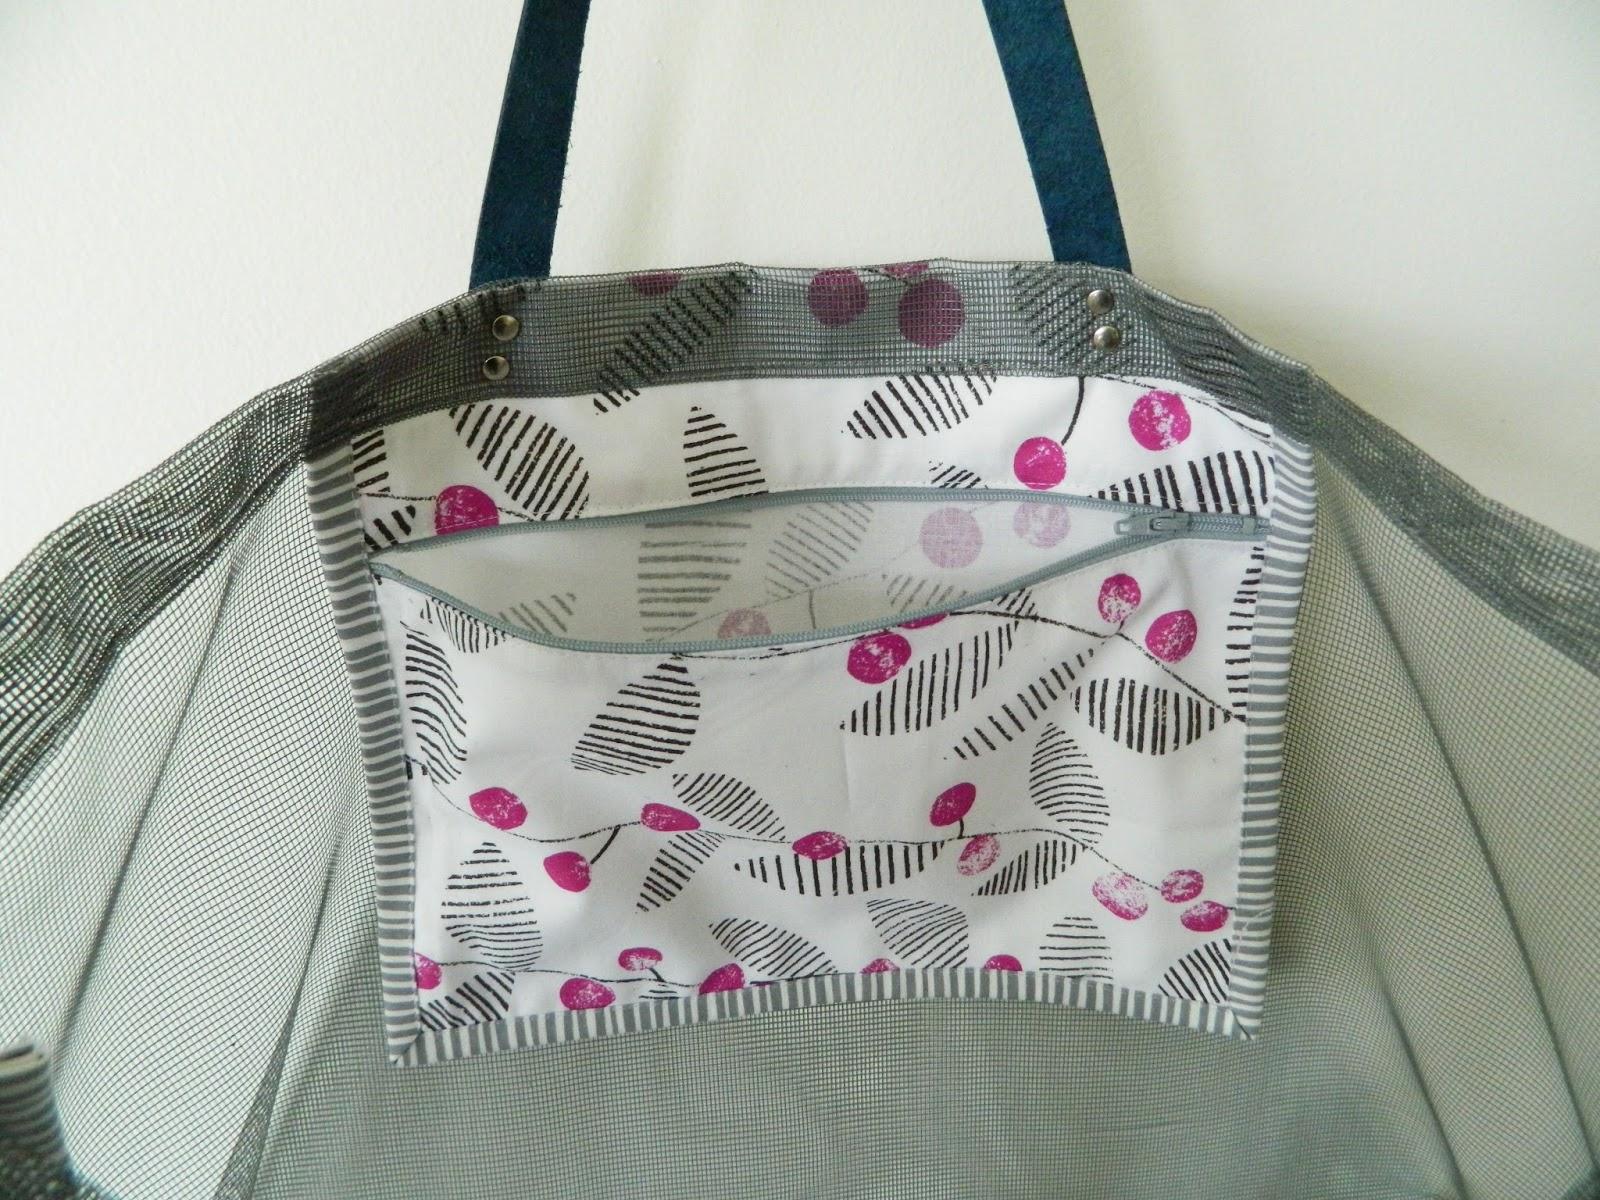 s.o.t.a.k handmade: mesh beach bag